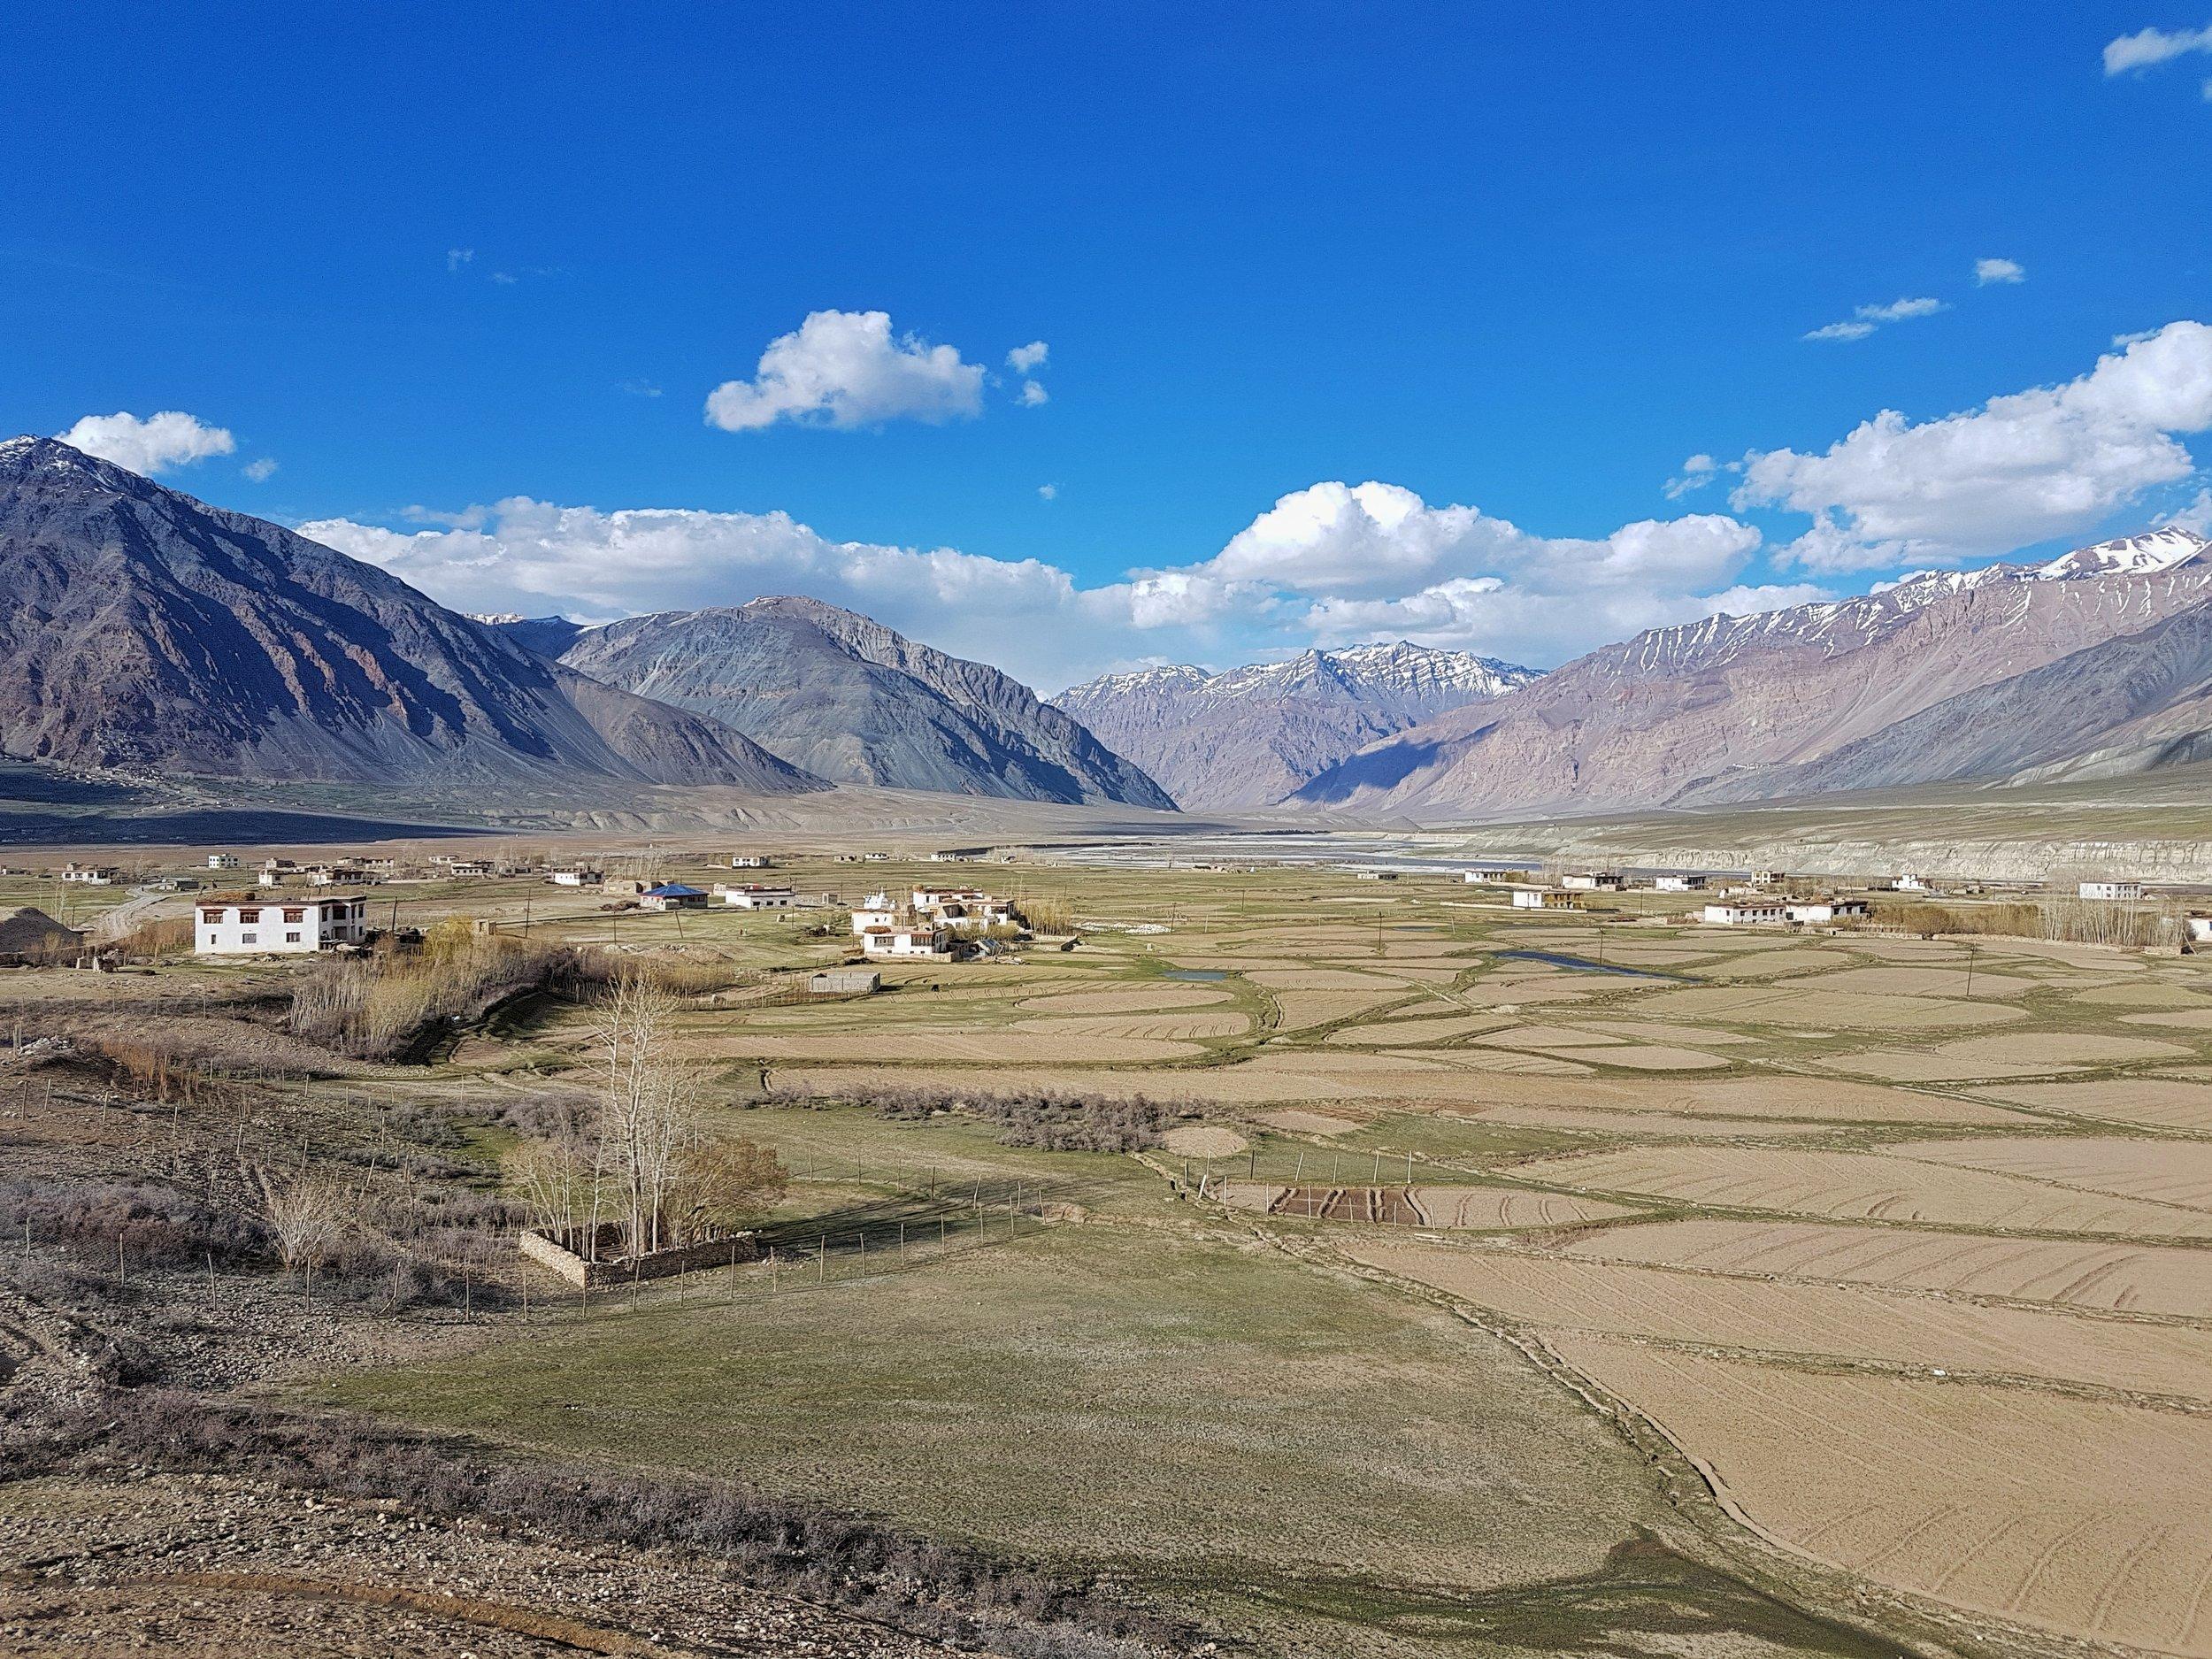 The flat valleys of Padum